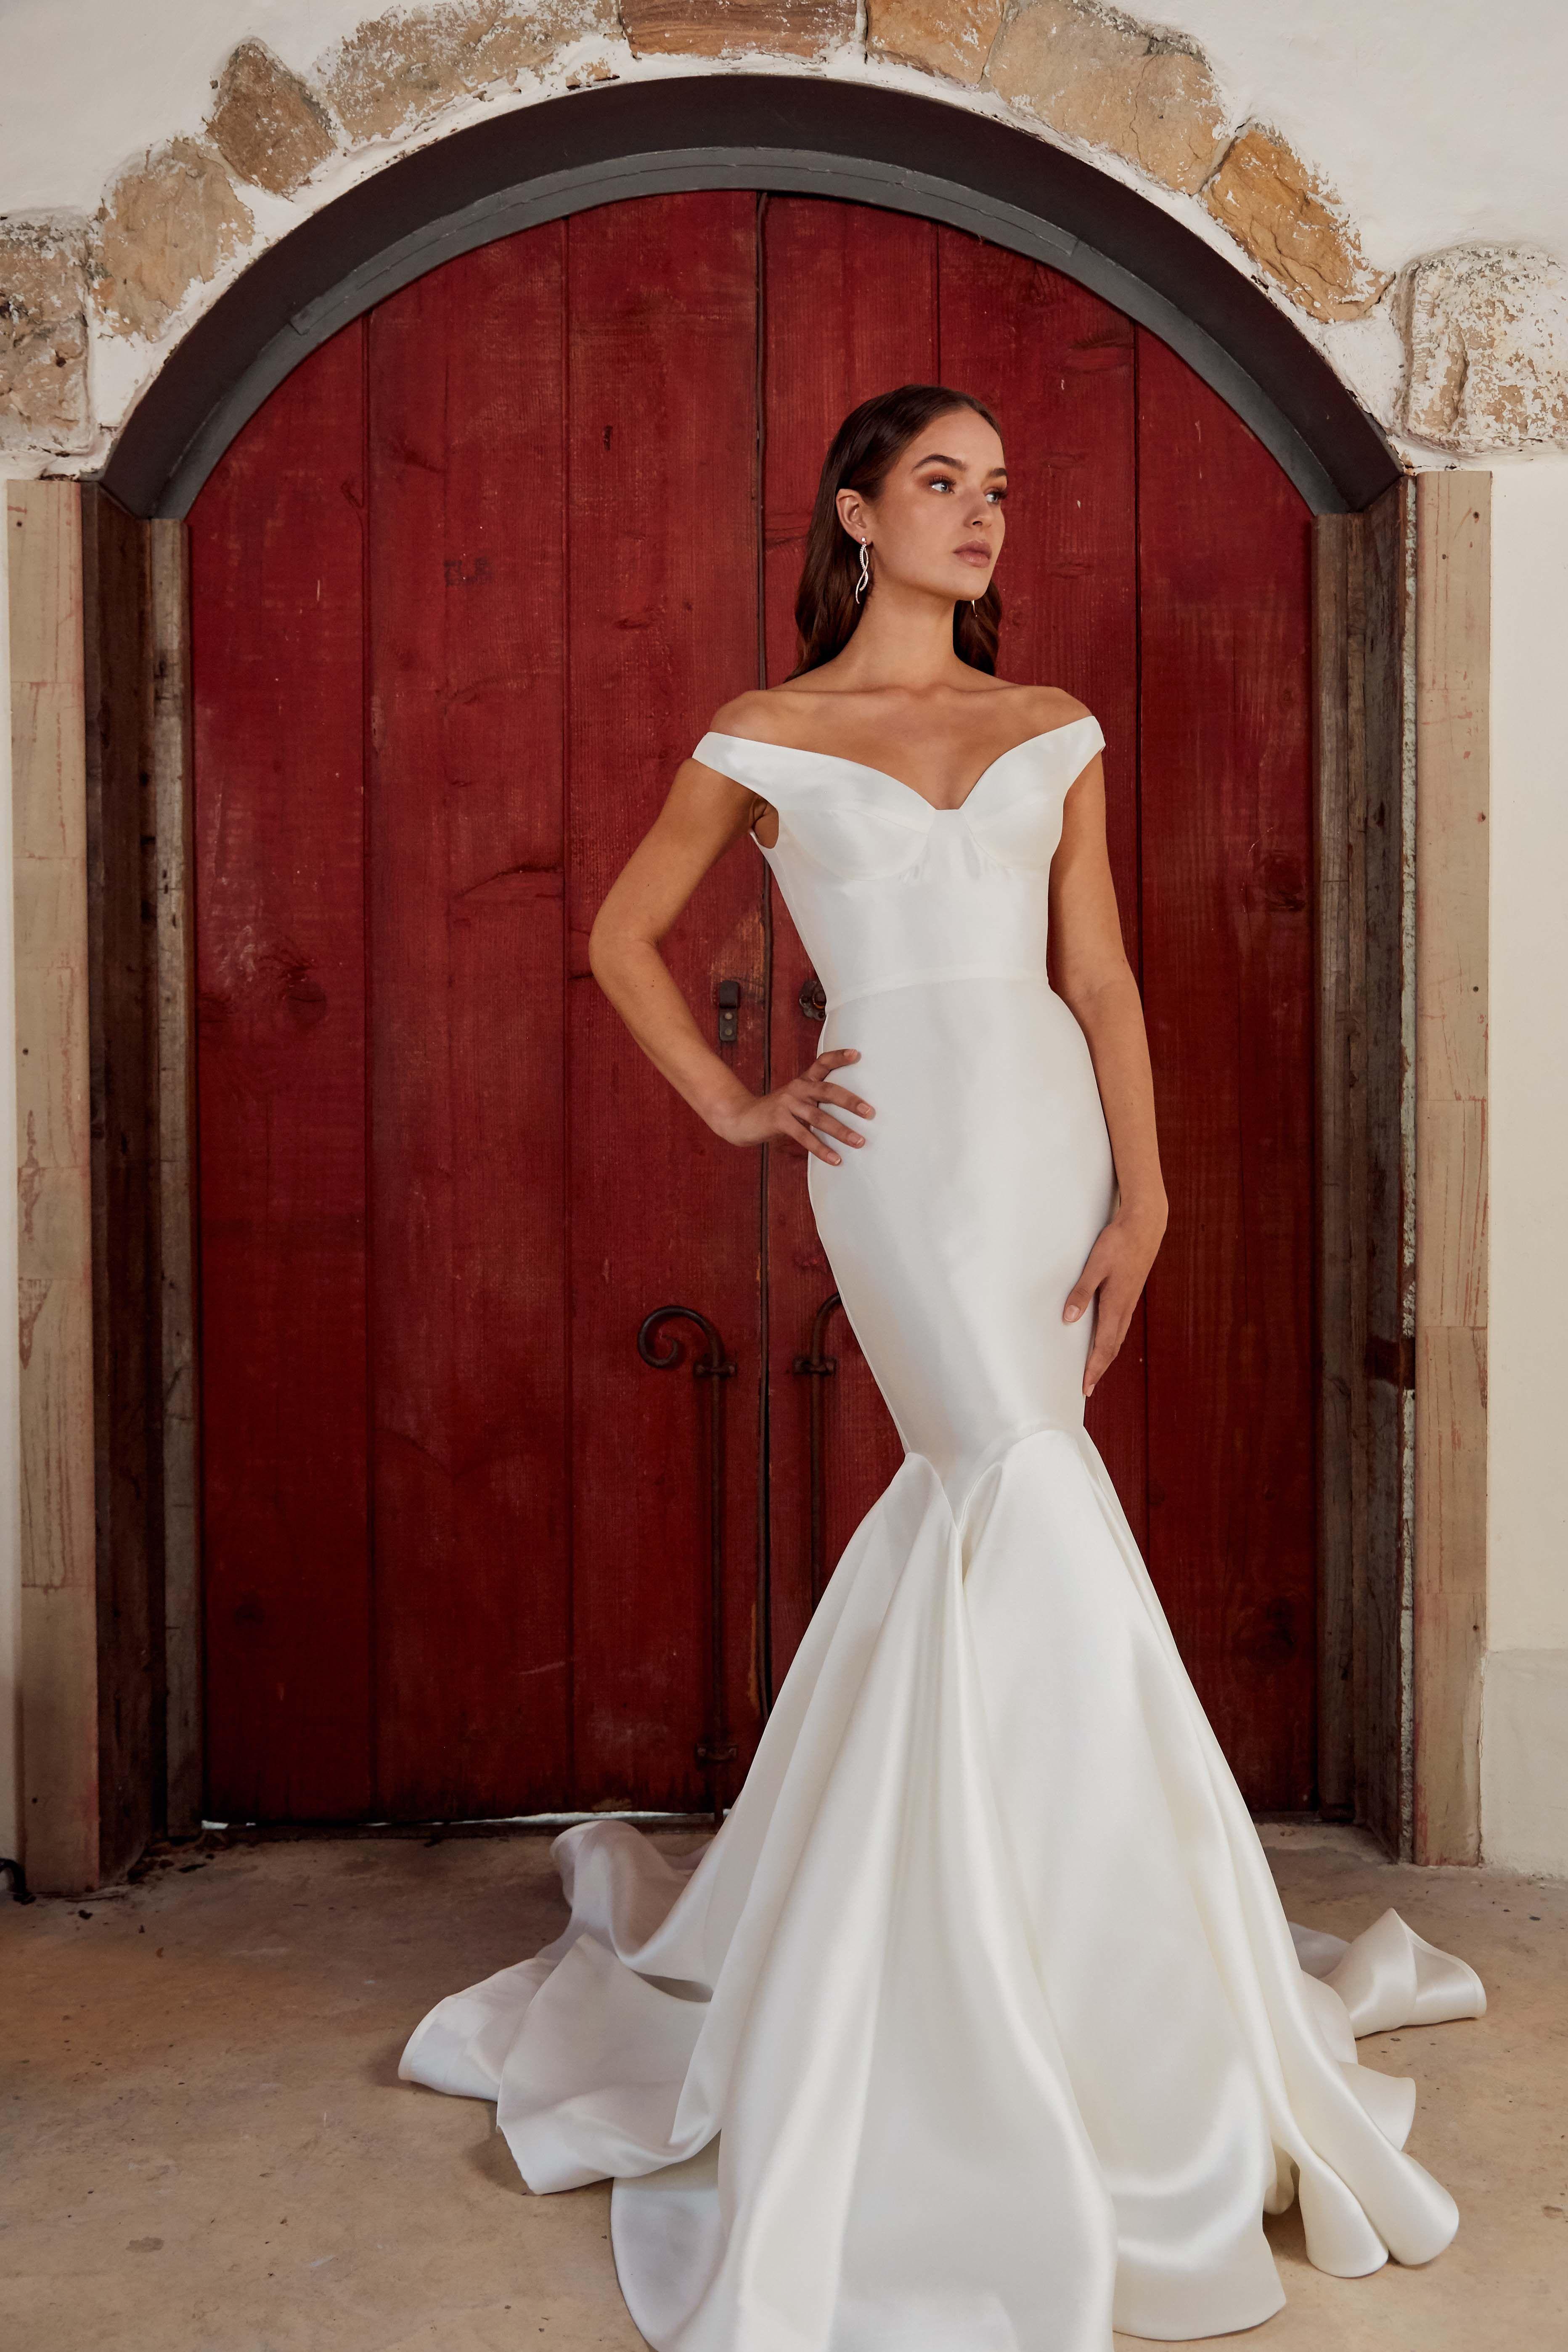 Leah Da Gloria Celeste Bridal Gown Available At Dimitrasbridal